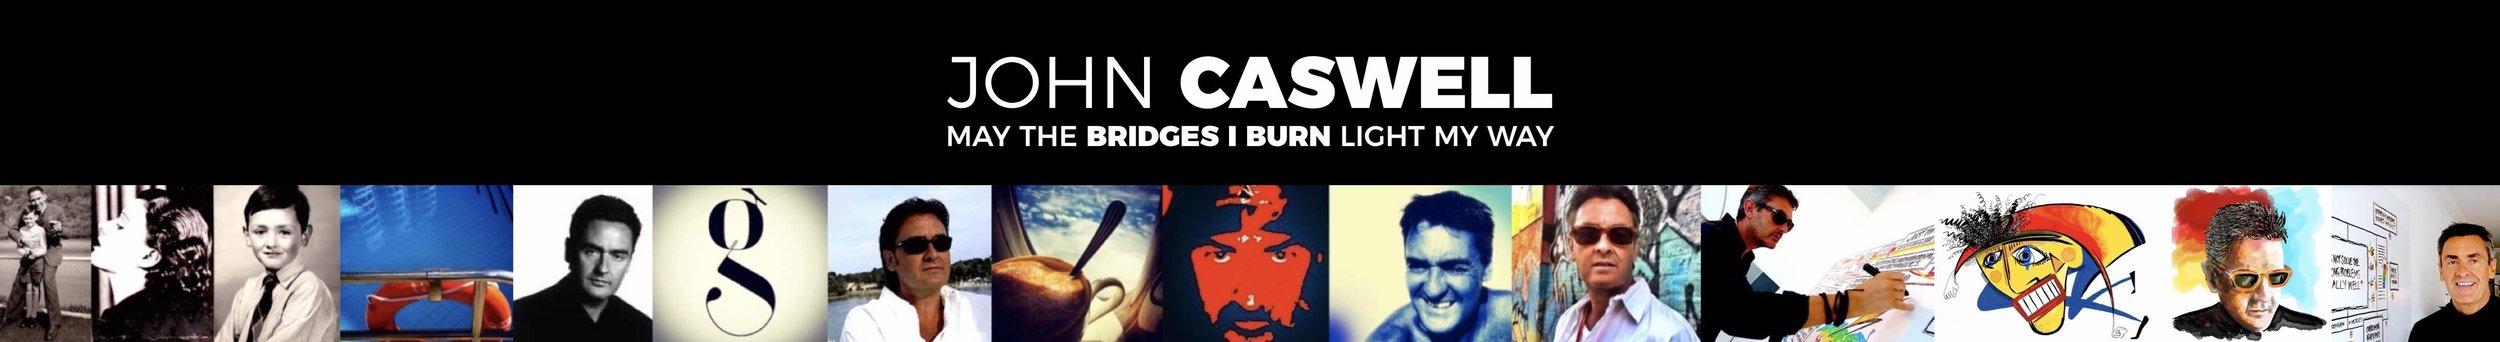 MAY THE BRIDGES I BURN LIGHT MY WAY.jpg